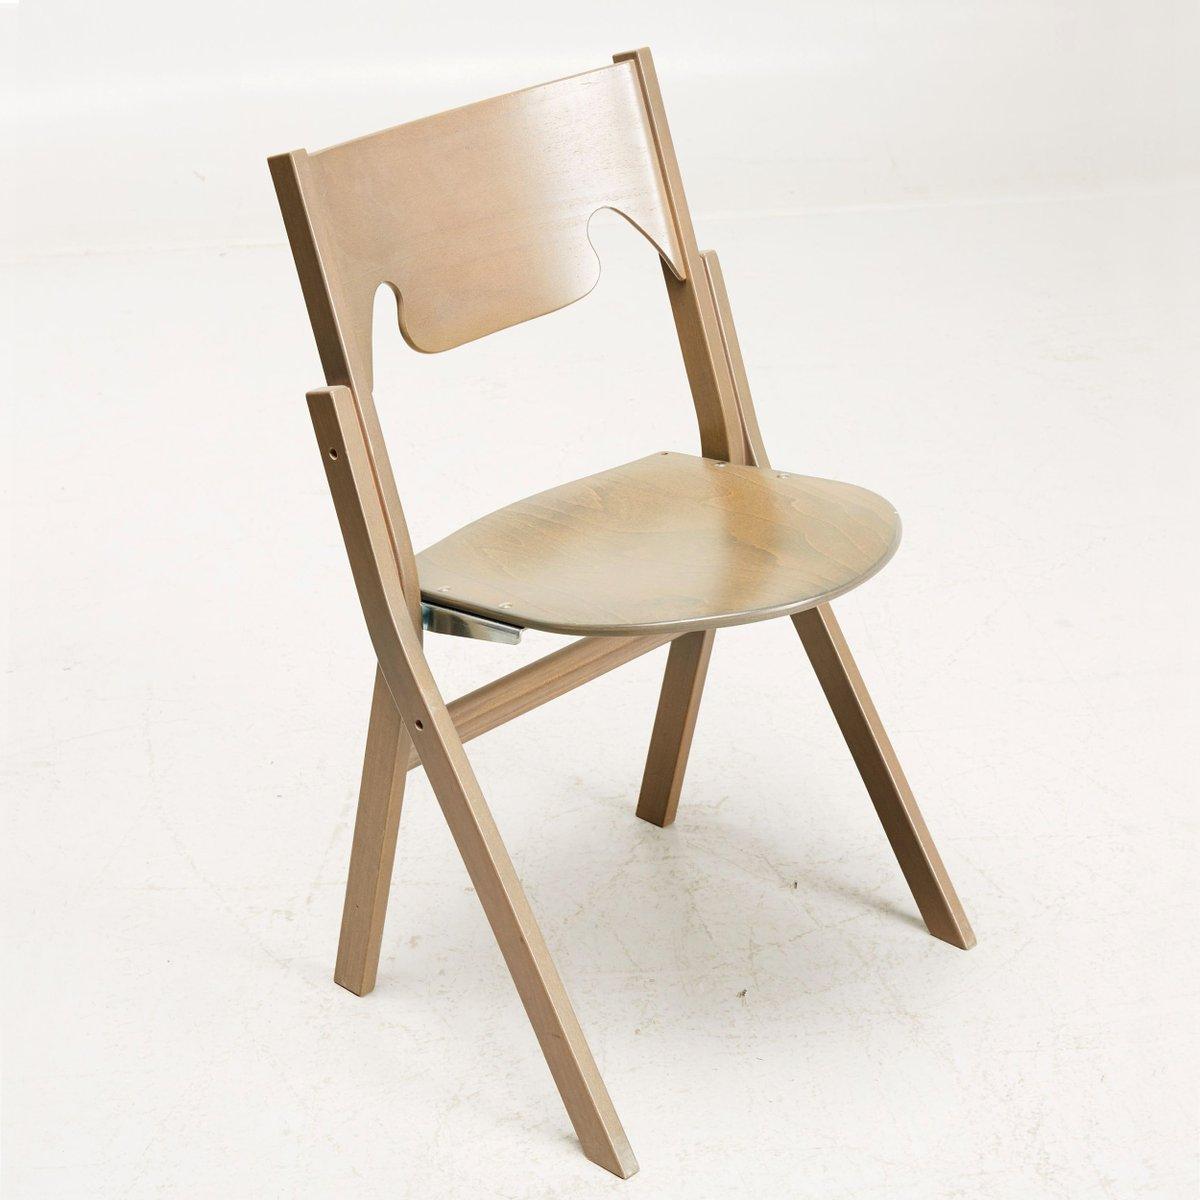 Scandinavian Modern Folding Chairs By Ake Axelsson, Set Of 24